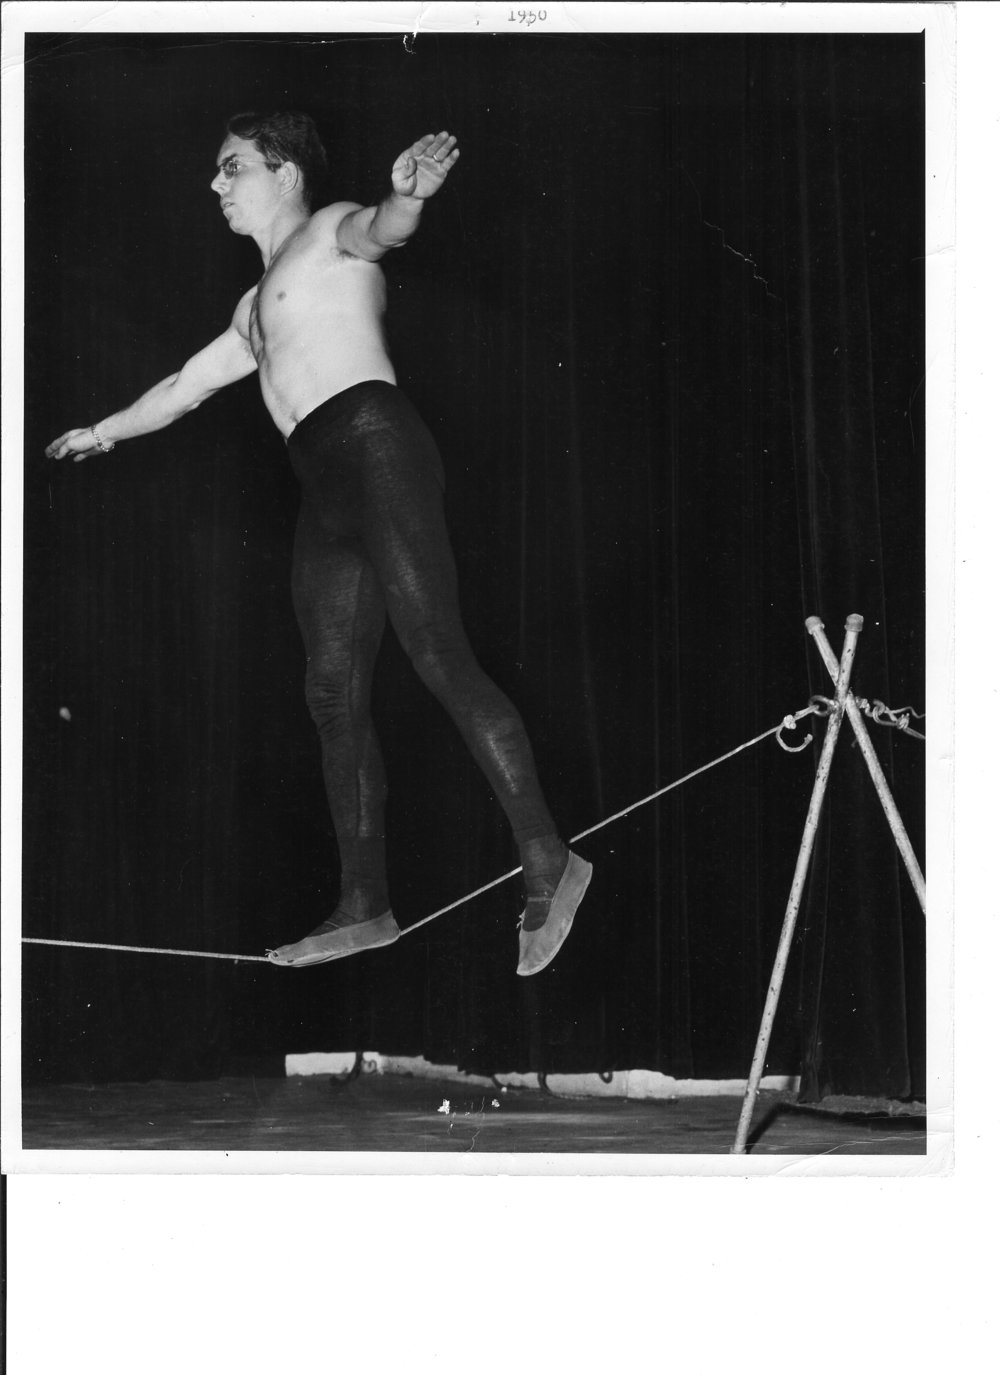 1950 Johnny Wilkerson.jpg